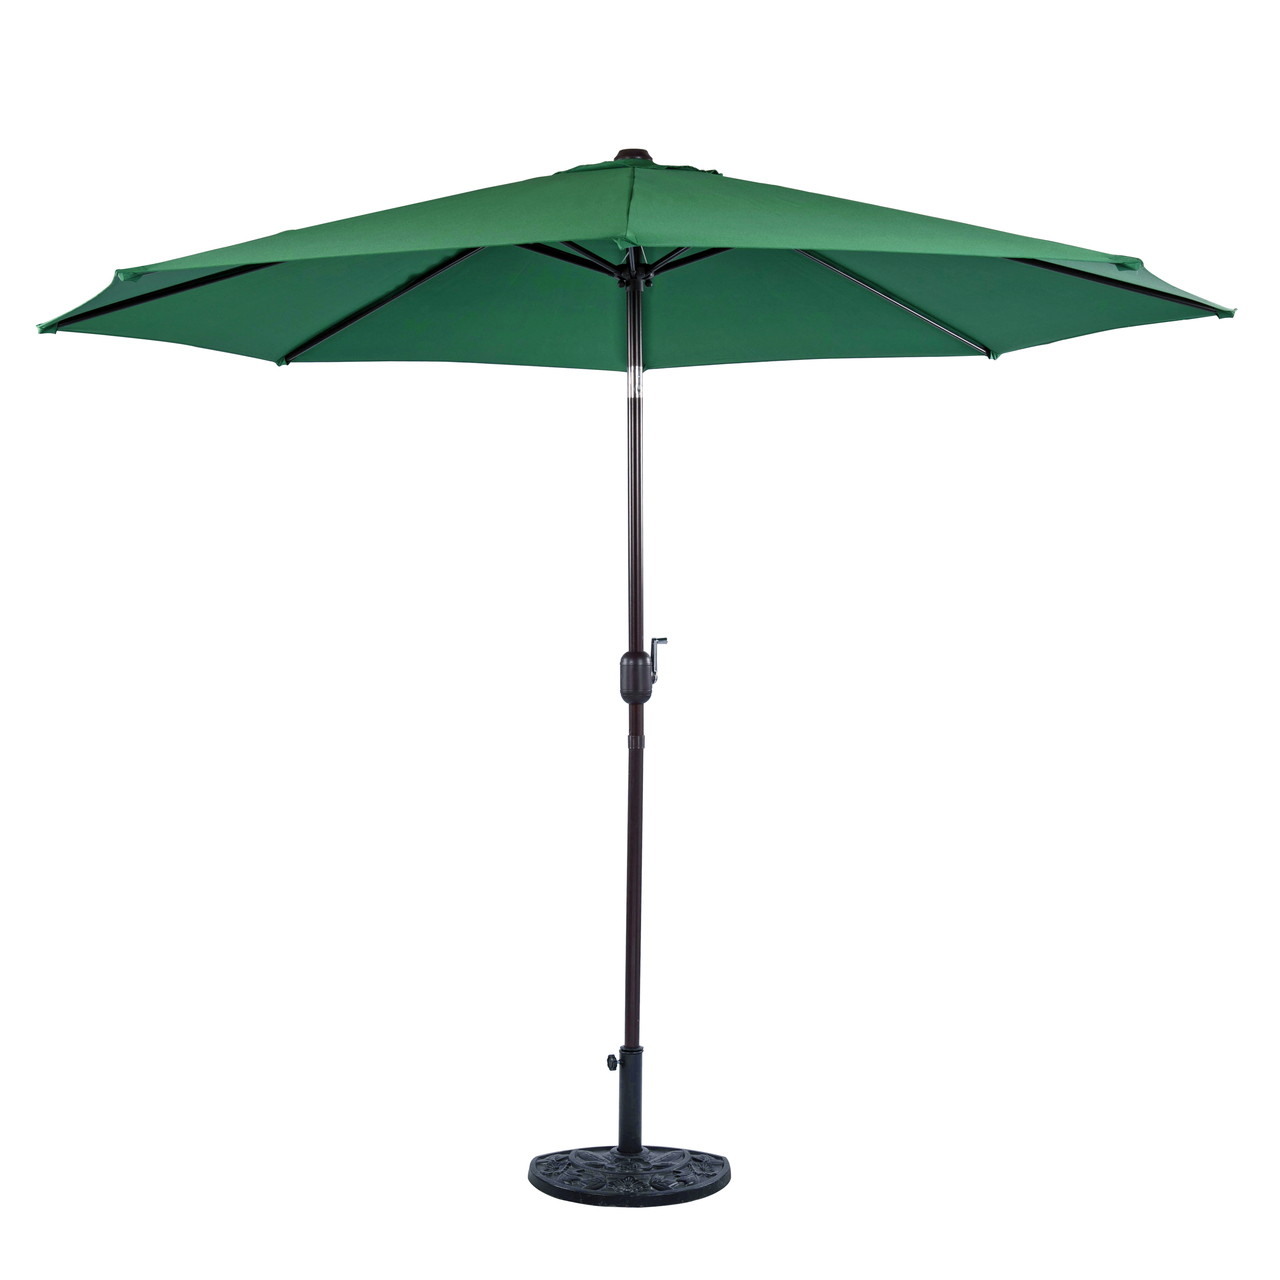 10 Feet Aluminum Patio Umbrella With Crank And Push Button Tilt, 8 Steel  Ribs (